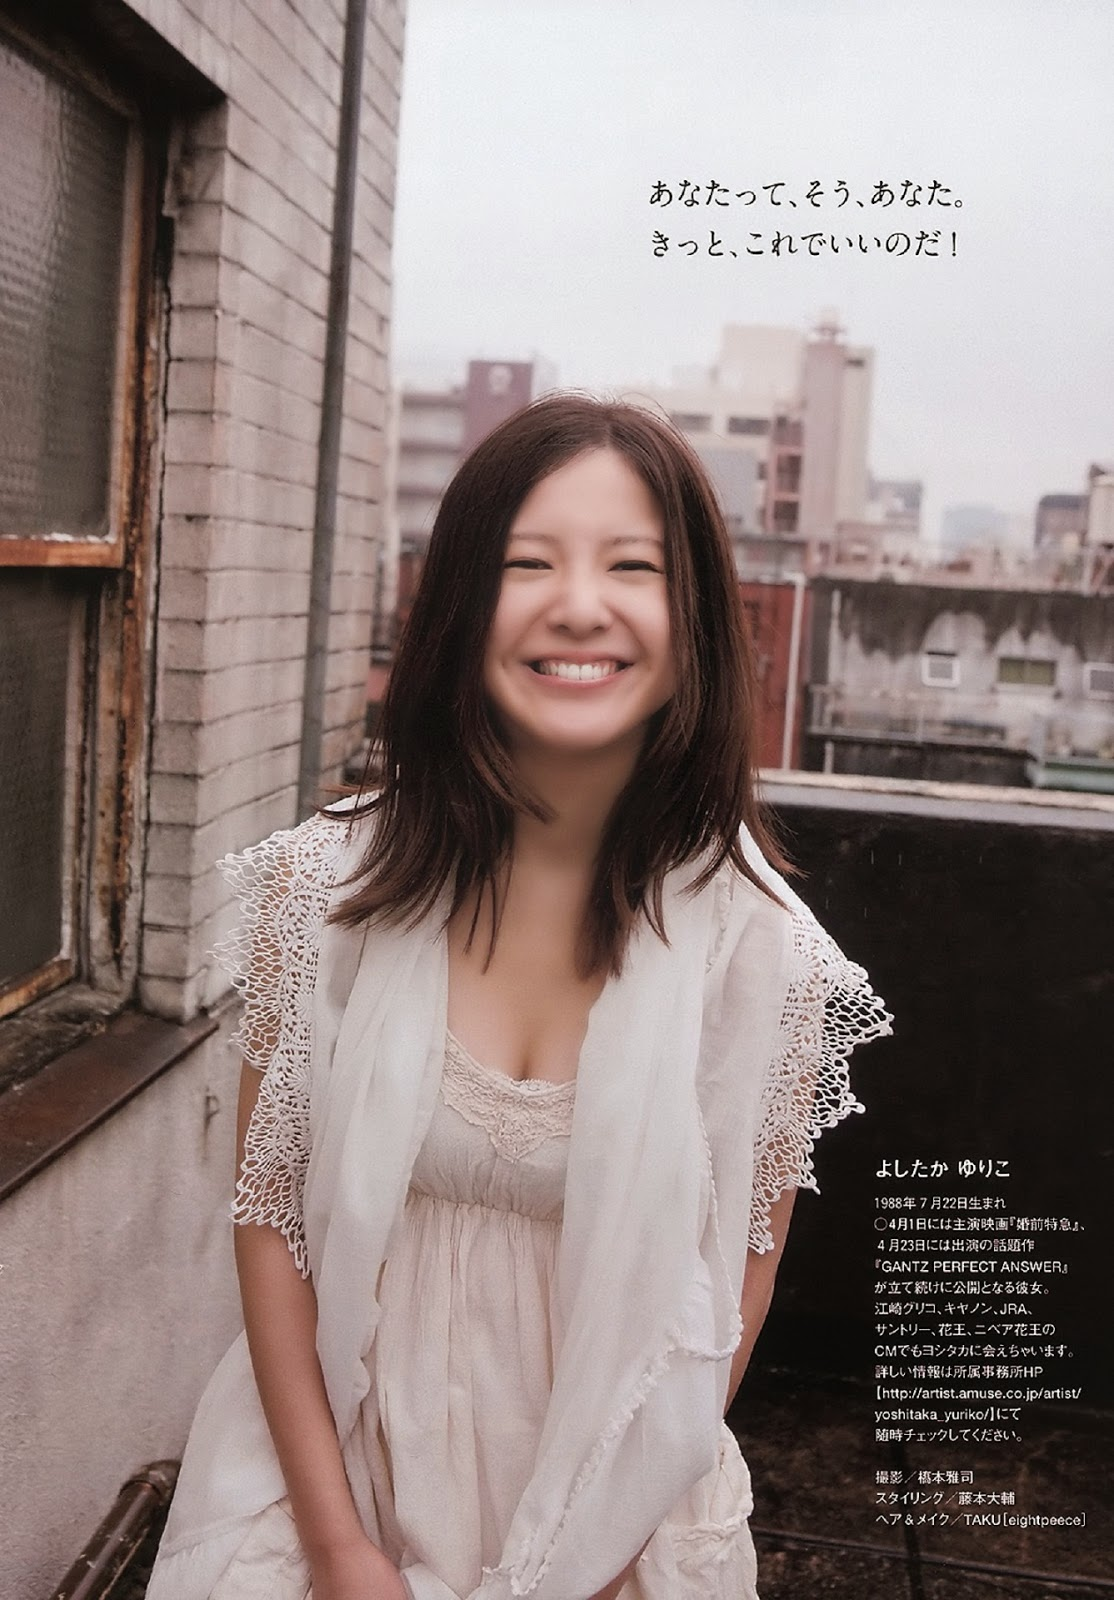 Yuriko Yoshitaka 吉高由里子 Weekly Playboy No 15 2011 Images 4